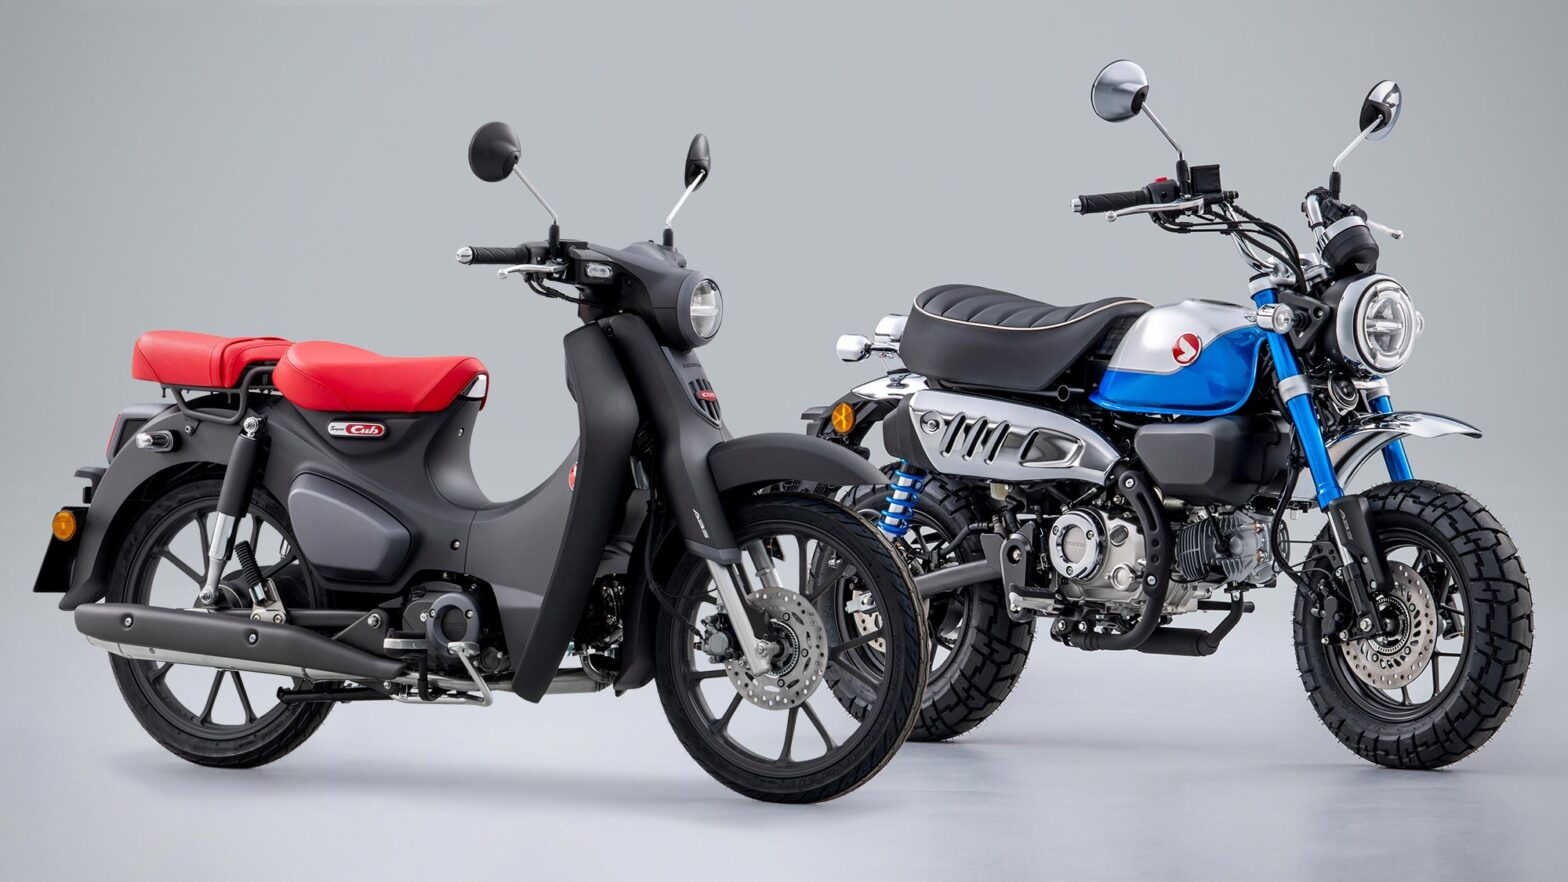 2022 Honda Super Cub and Monkey Motorcycles